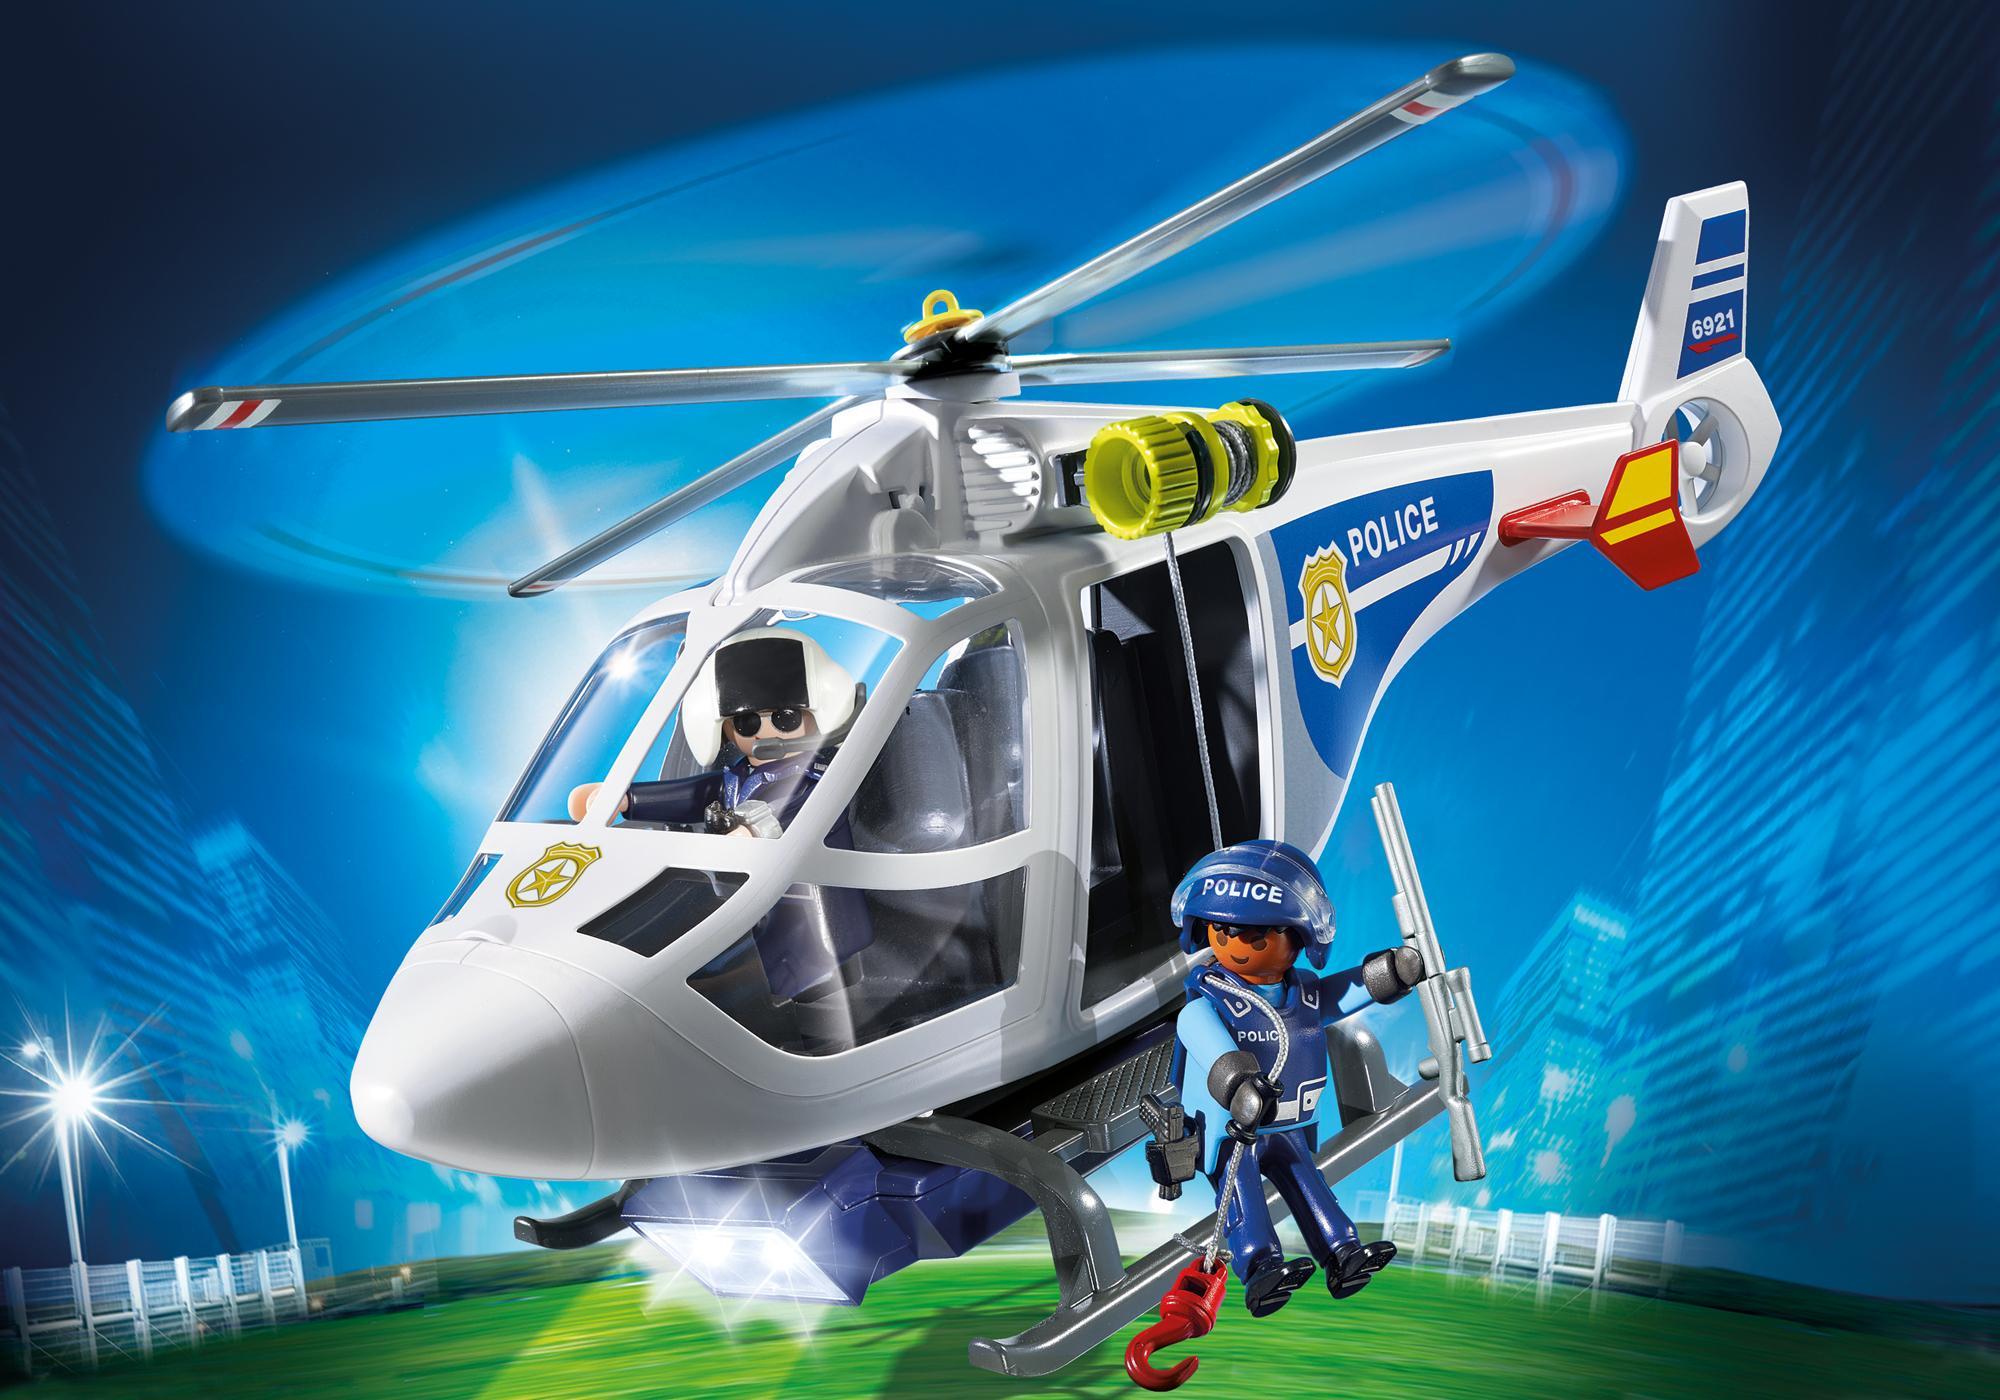 http://media.playmobil.com/i/playmobil/6921_product_detail/Helicóptero de Policía con Luces LED